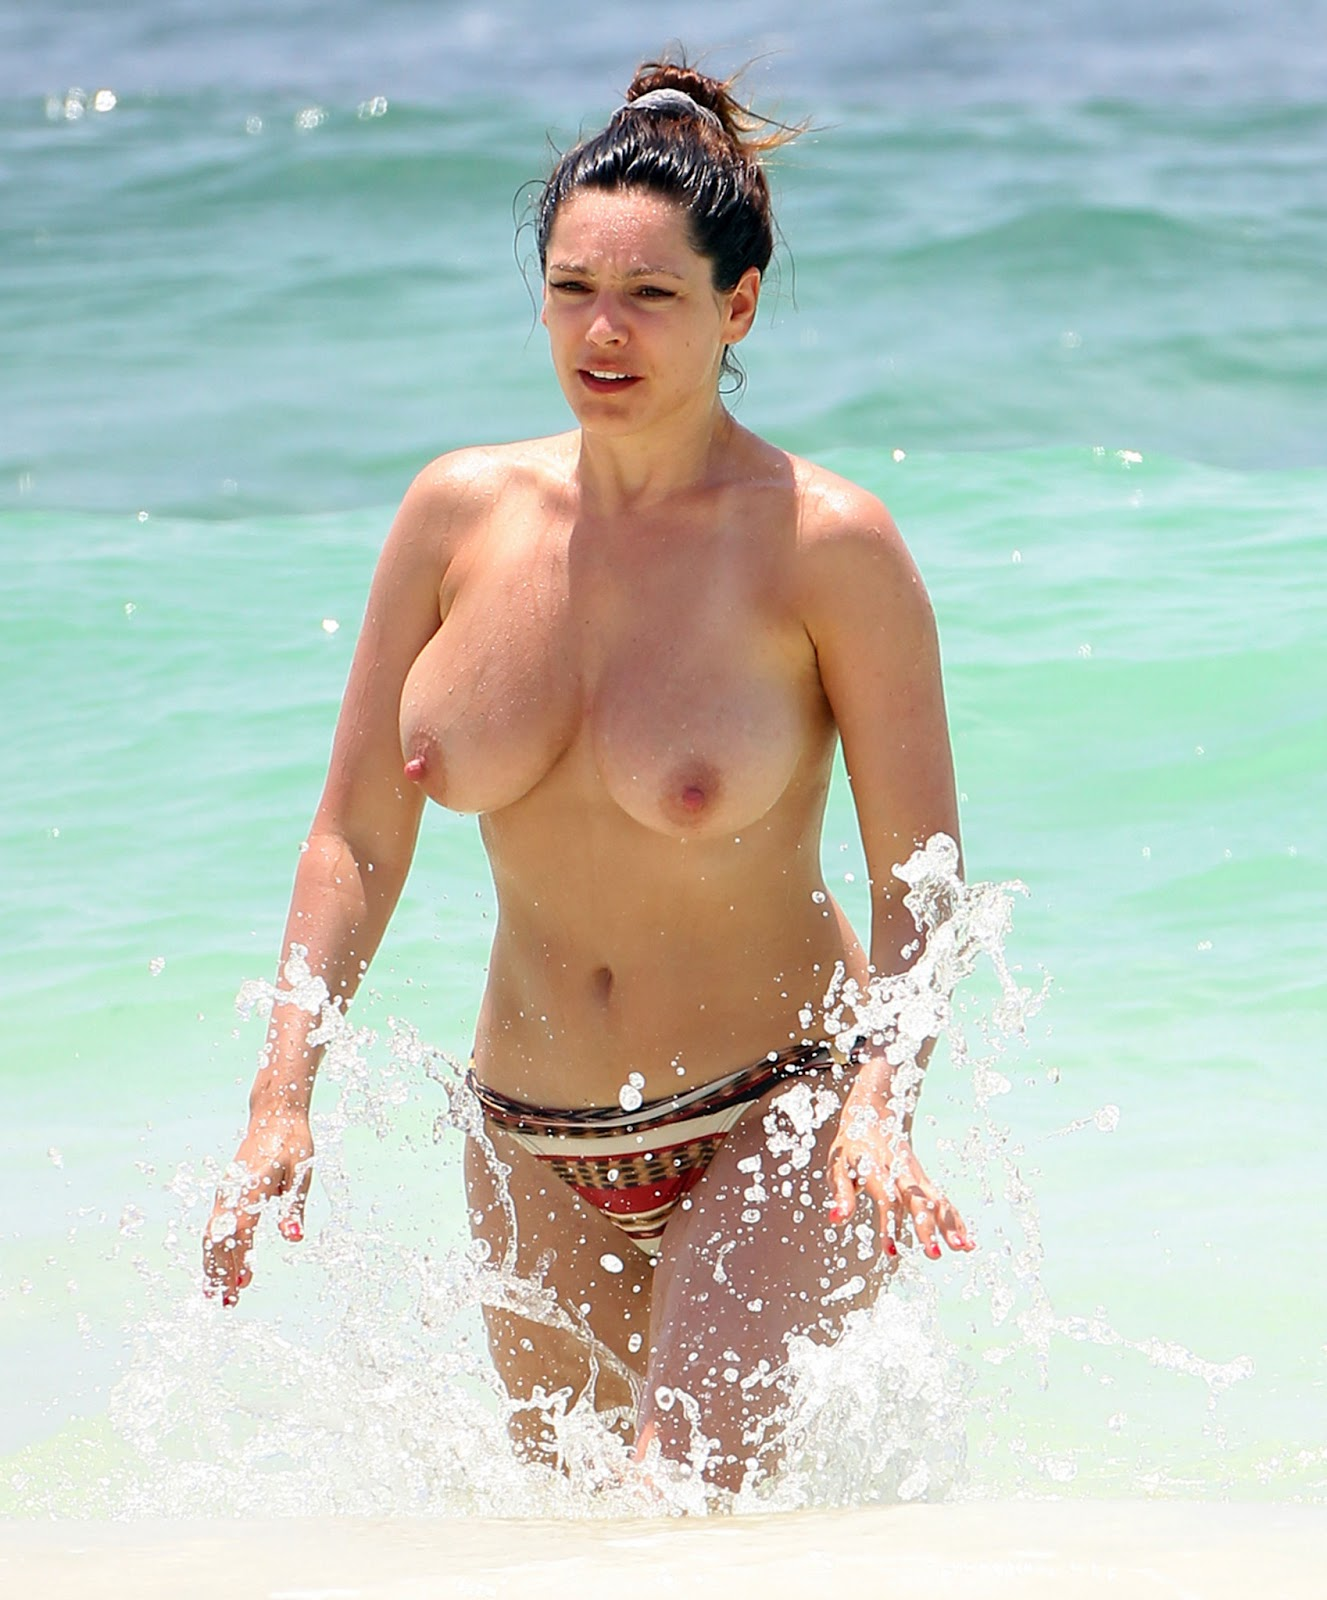 kelly brook telanjang dada di pantai cancun mexico jasmaniah